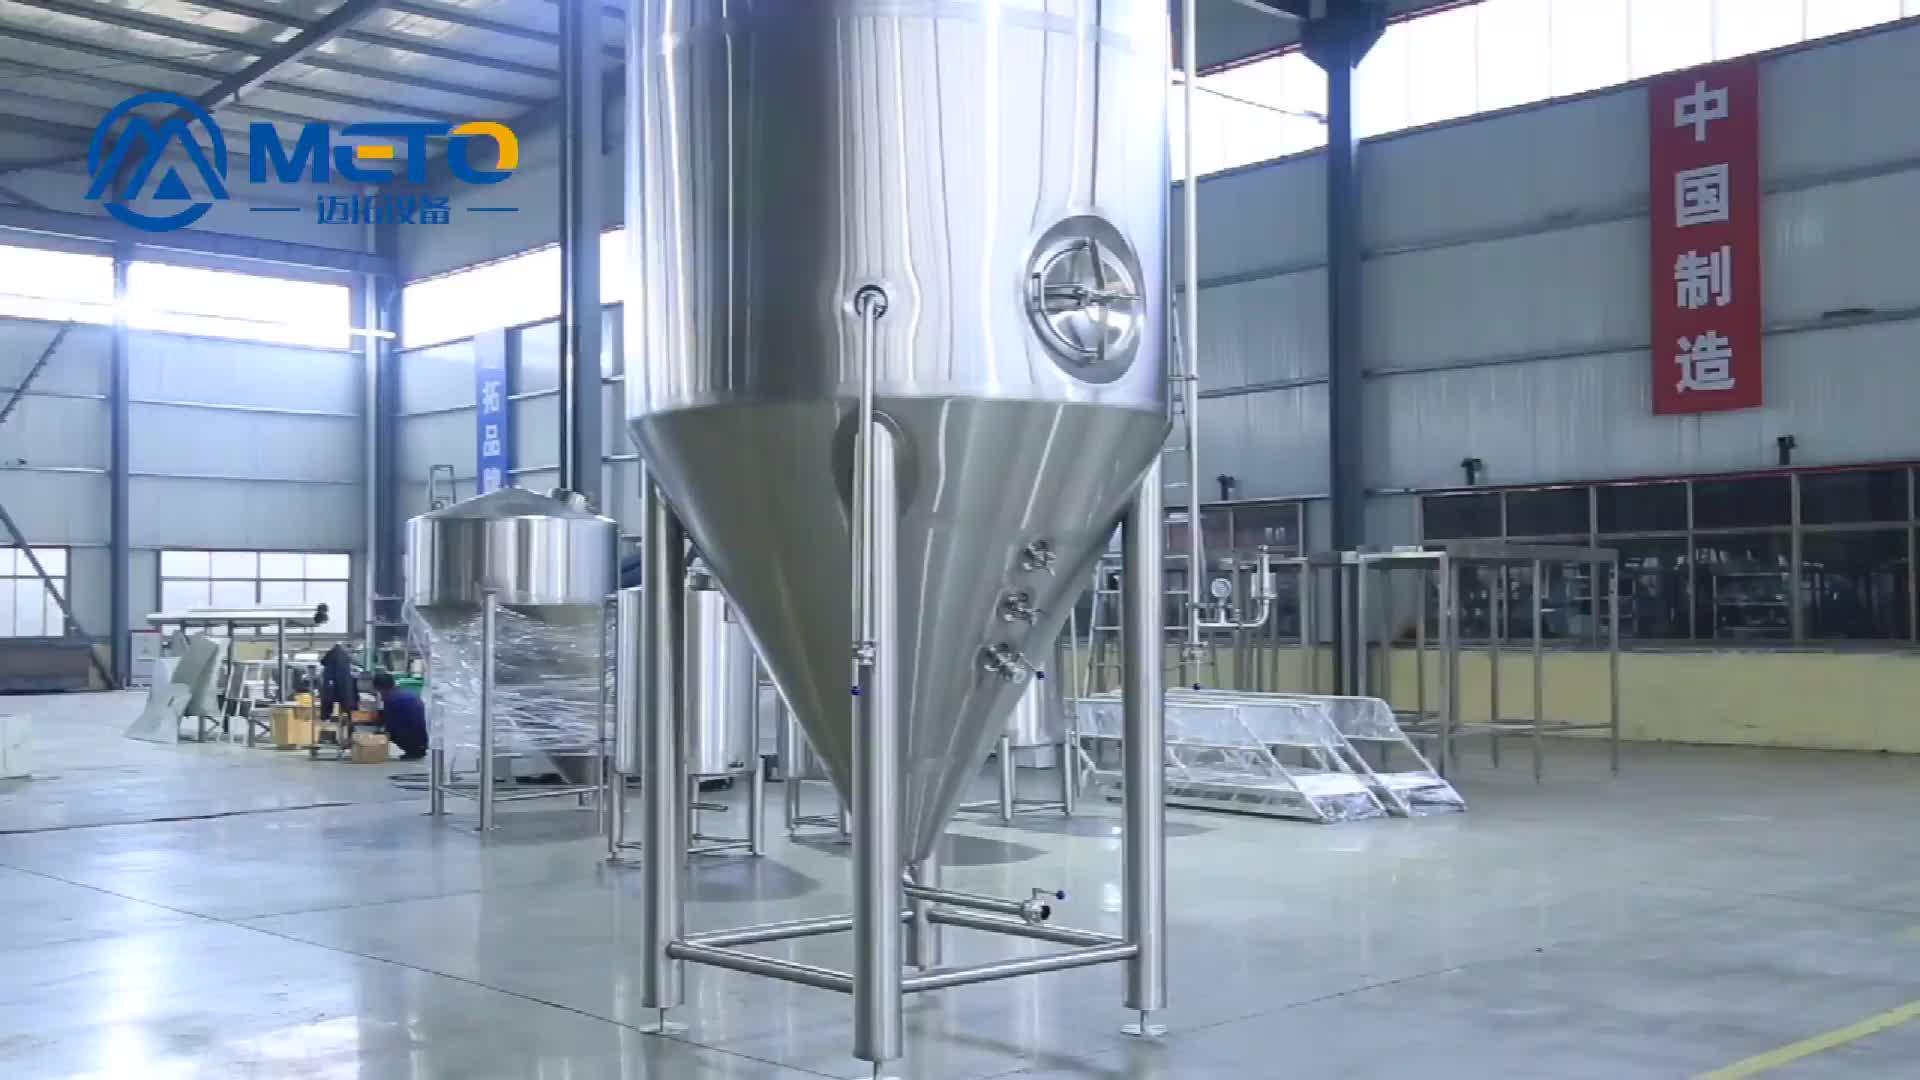 1000L 2000L बिक्री के लिए स्टेनलेस स्टील बीयर किण्वक टैंक औद्योगिक किण्वक Unitank